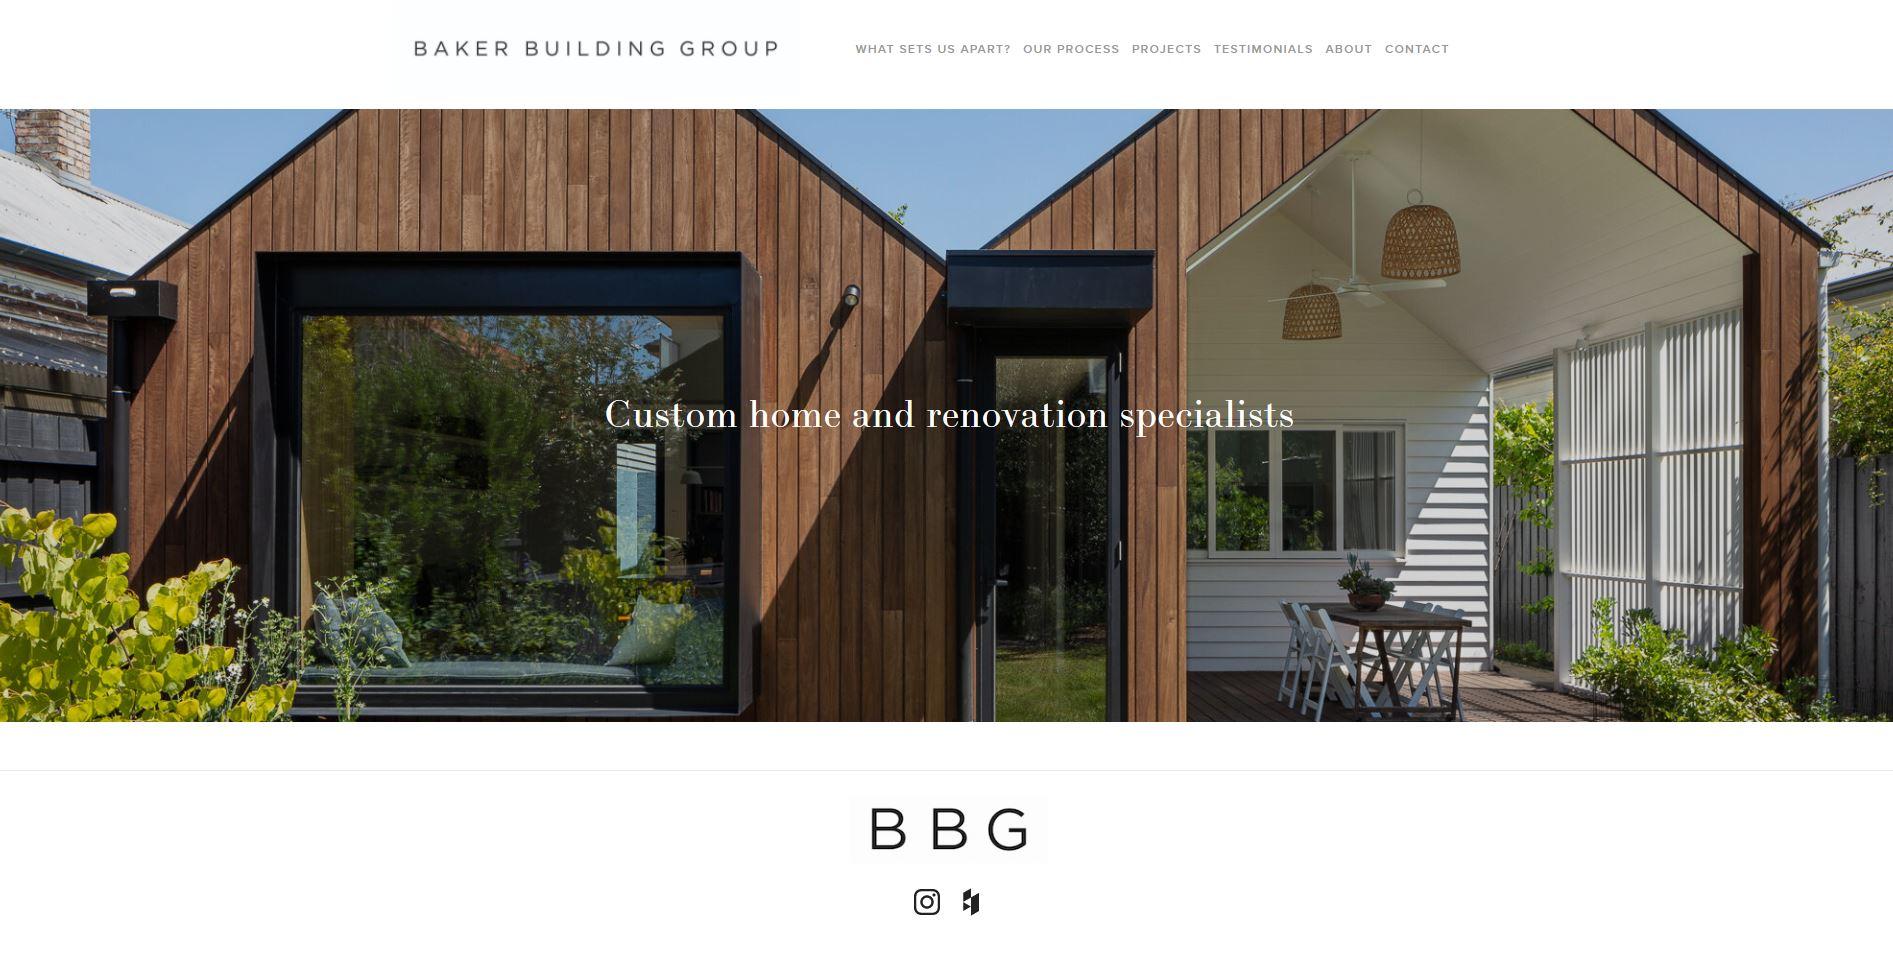 Baker Building Group